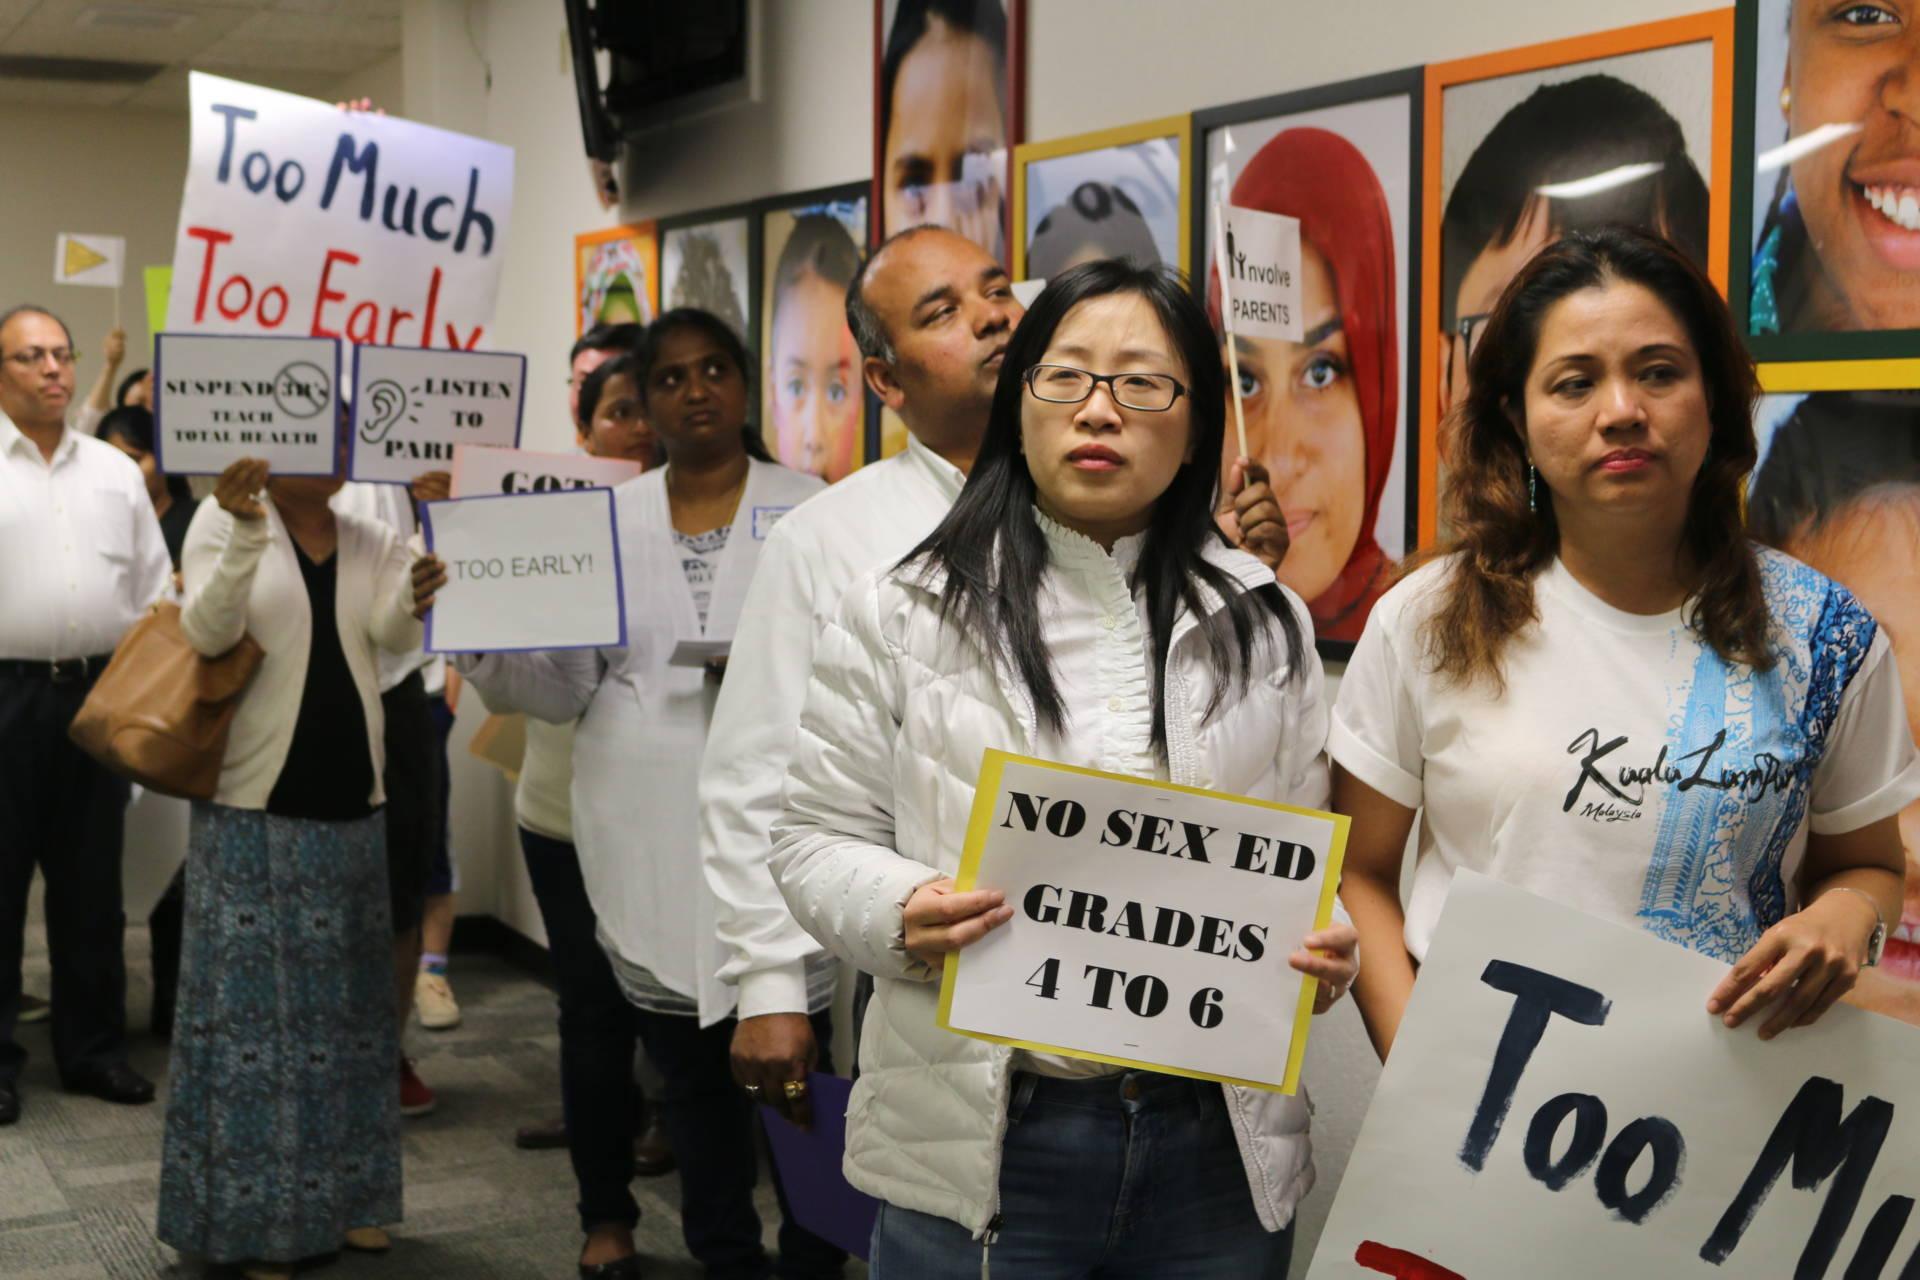 How Far Should Parents Dictate School Sex Ed? Debate Roils Bay Area  Community